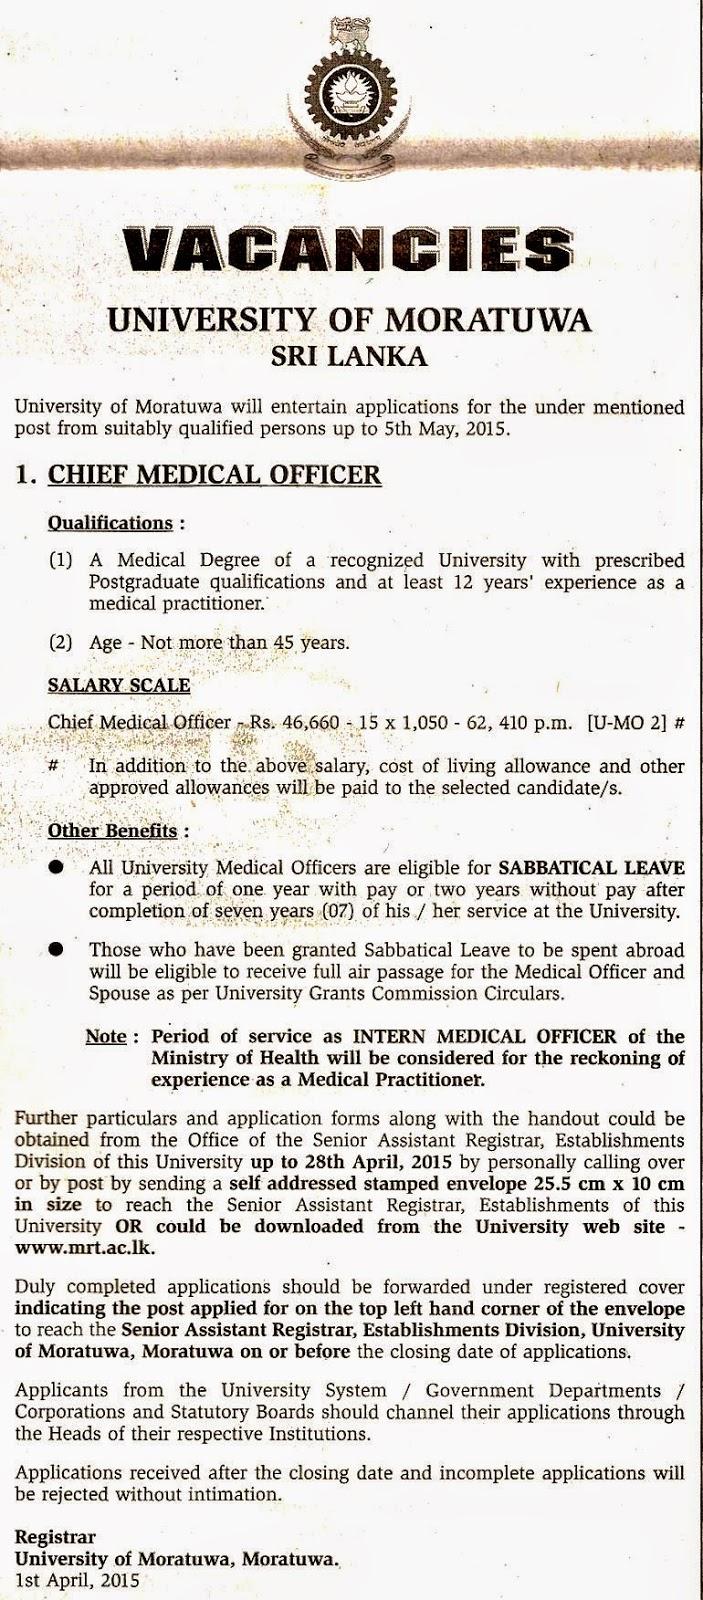 Chief Medical Officer Vacancies University of Moratuwa – Chief Medical Officer Job Description